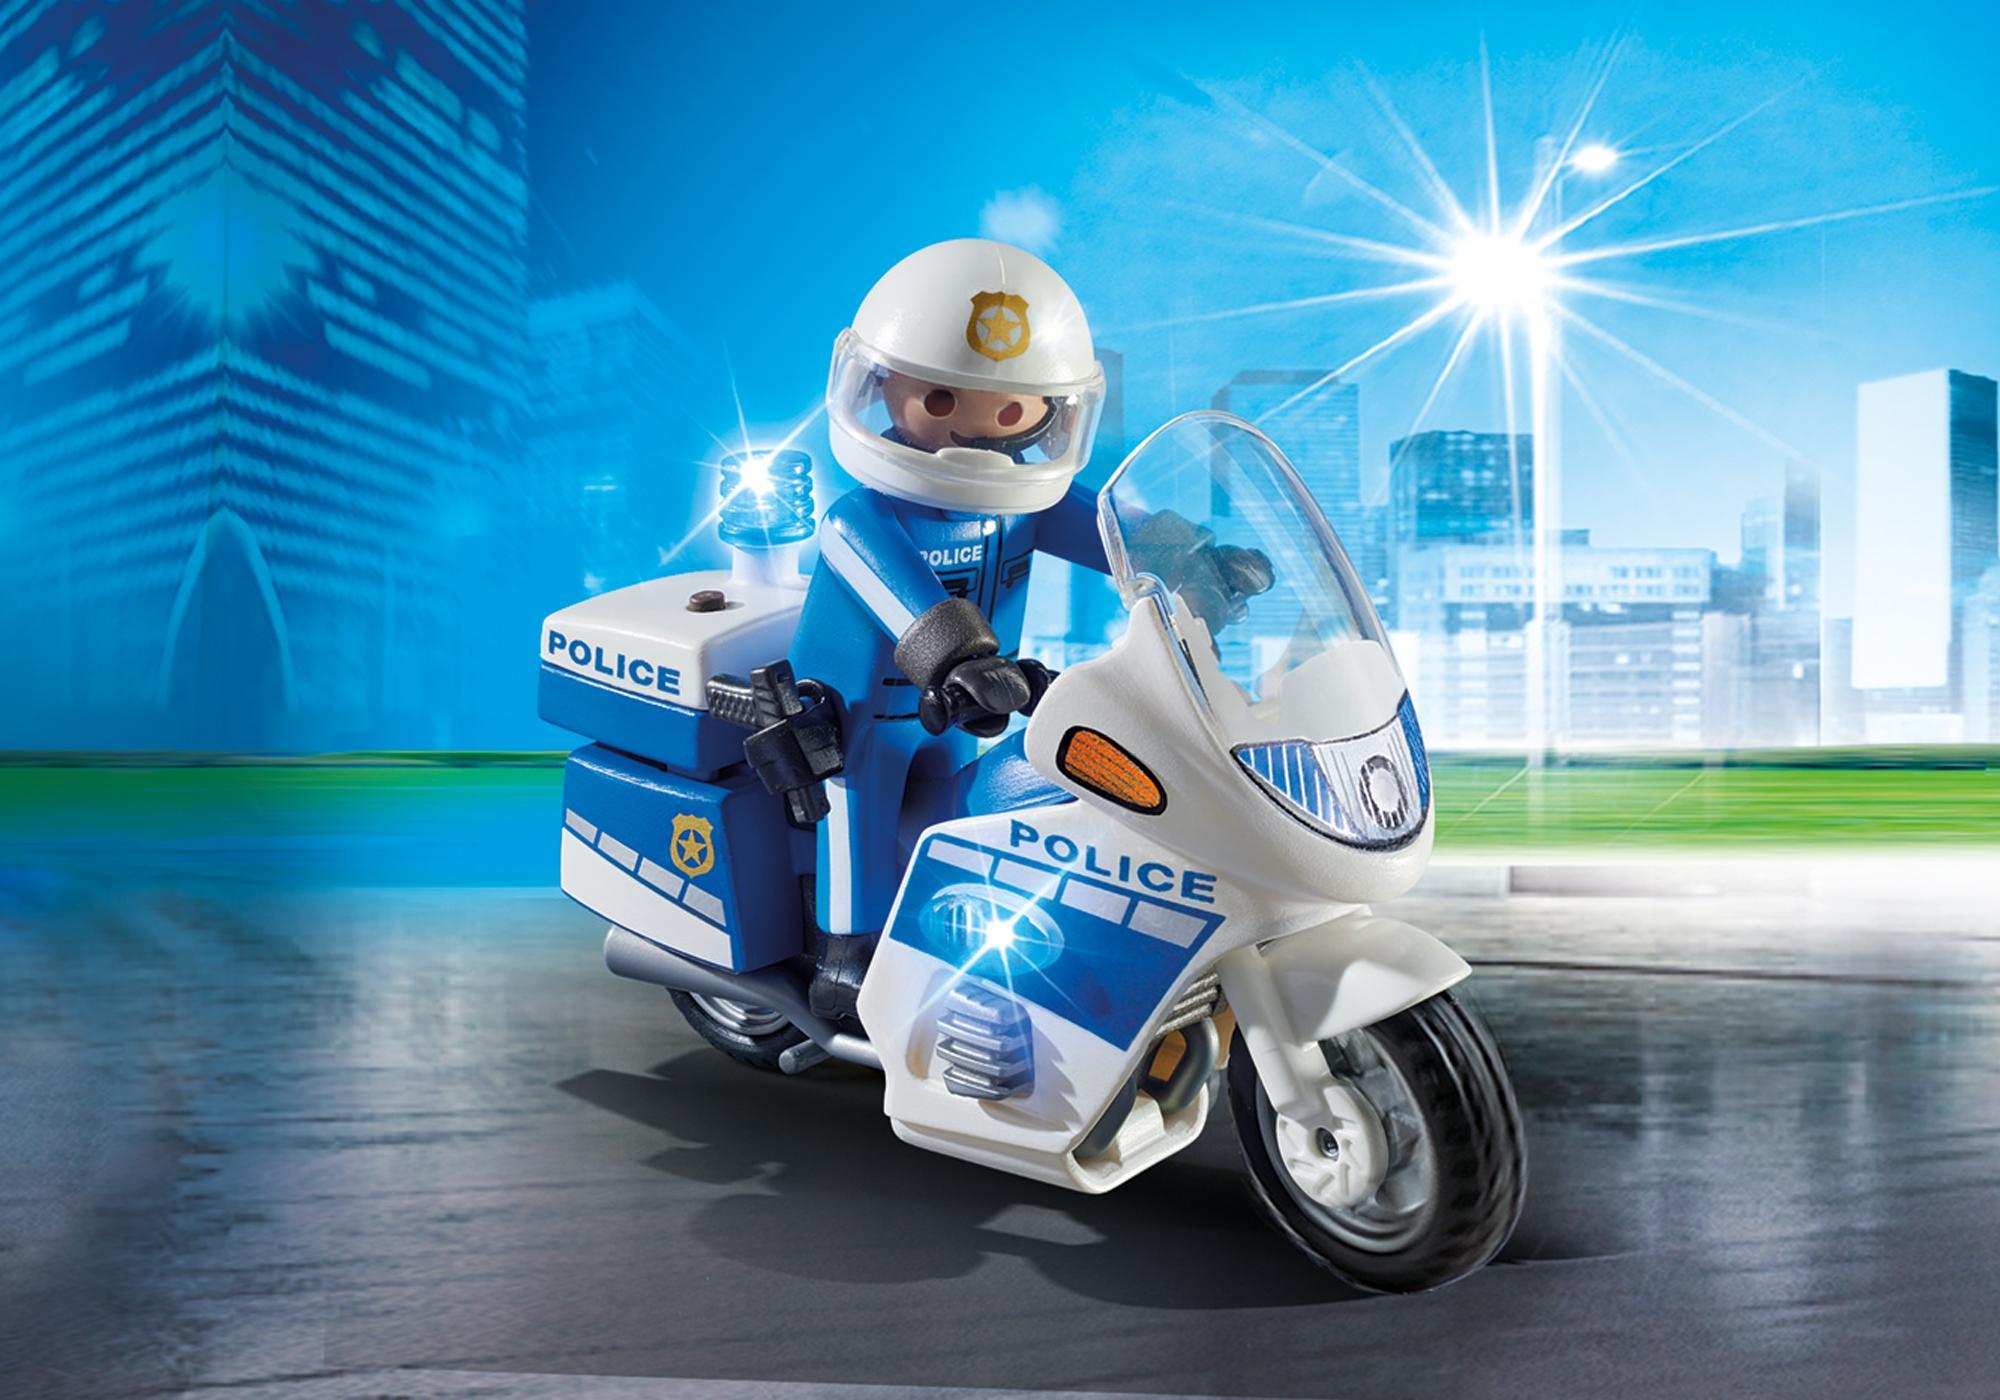 http://media.playmobil.com/i/playmobil/6923_product_detail/Police Bike with LED Light